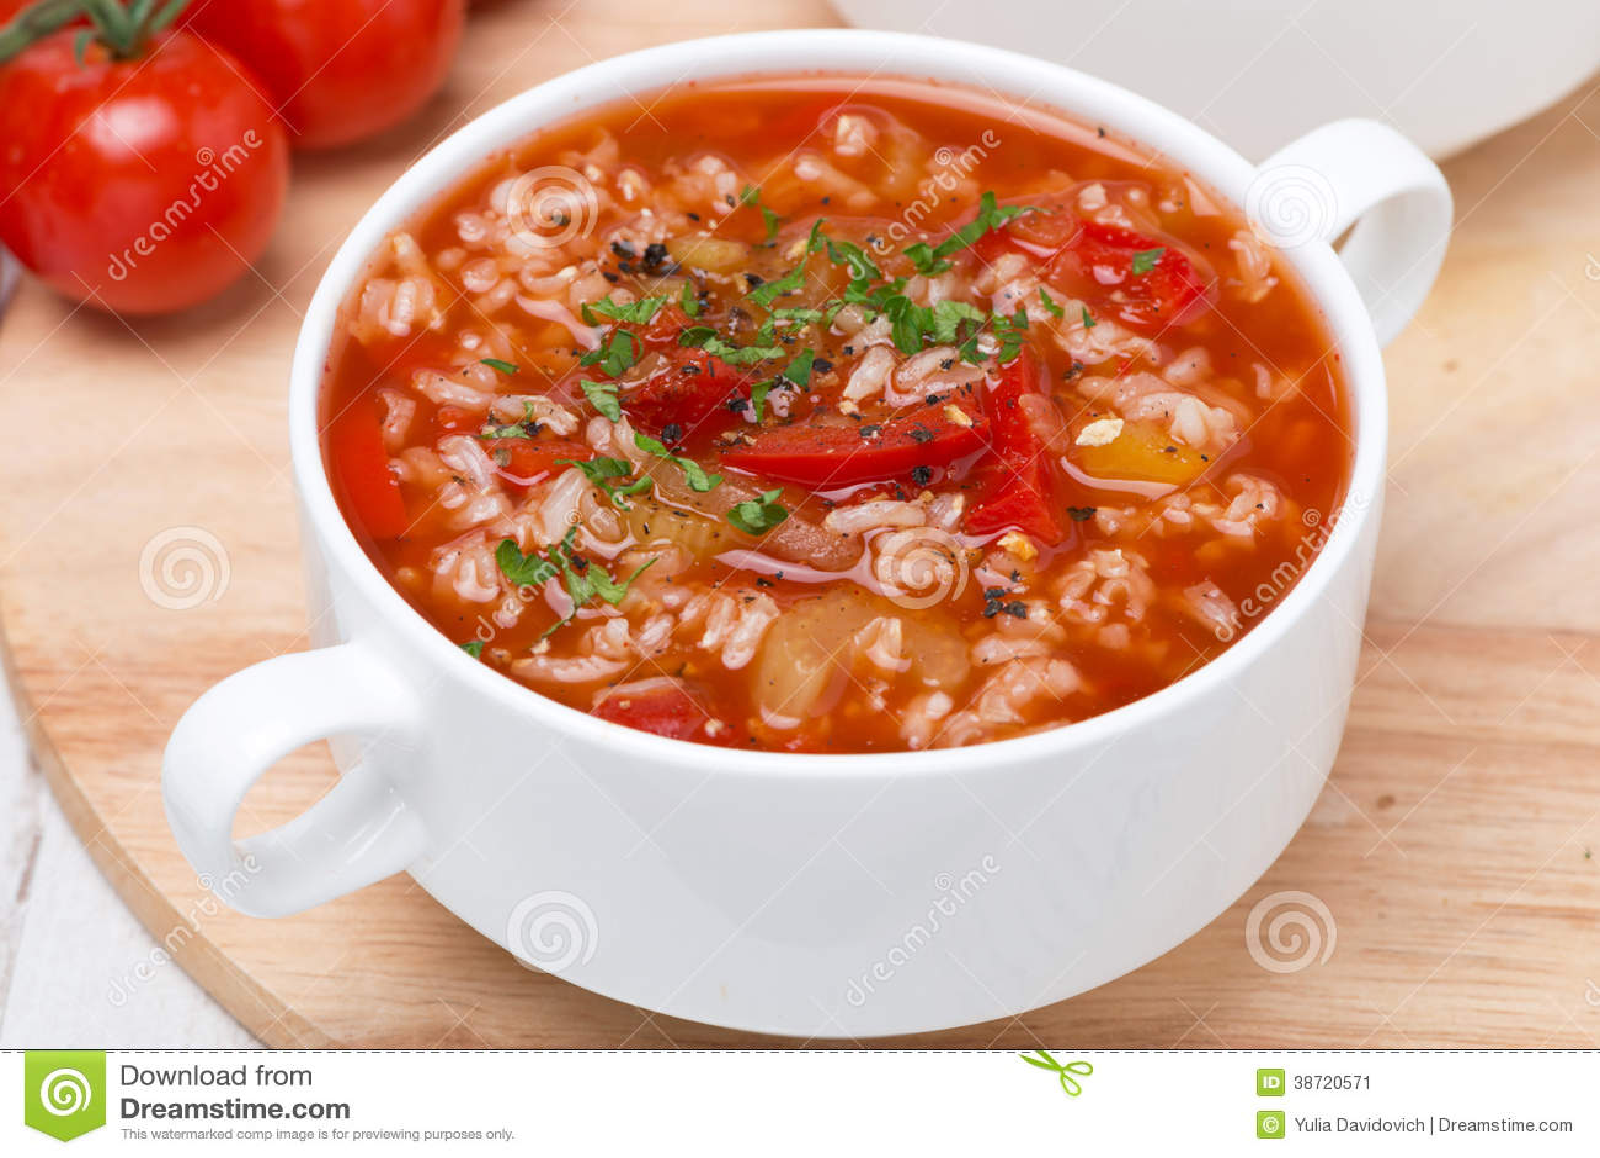 soupe tomate avec du riz des l gumes et des herbes. Black Bedroom Furniture Sets. Home Design Ideas